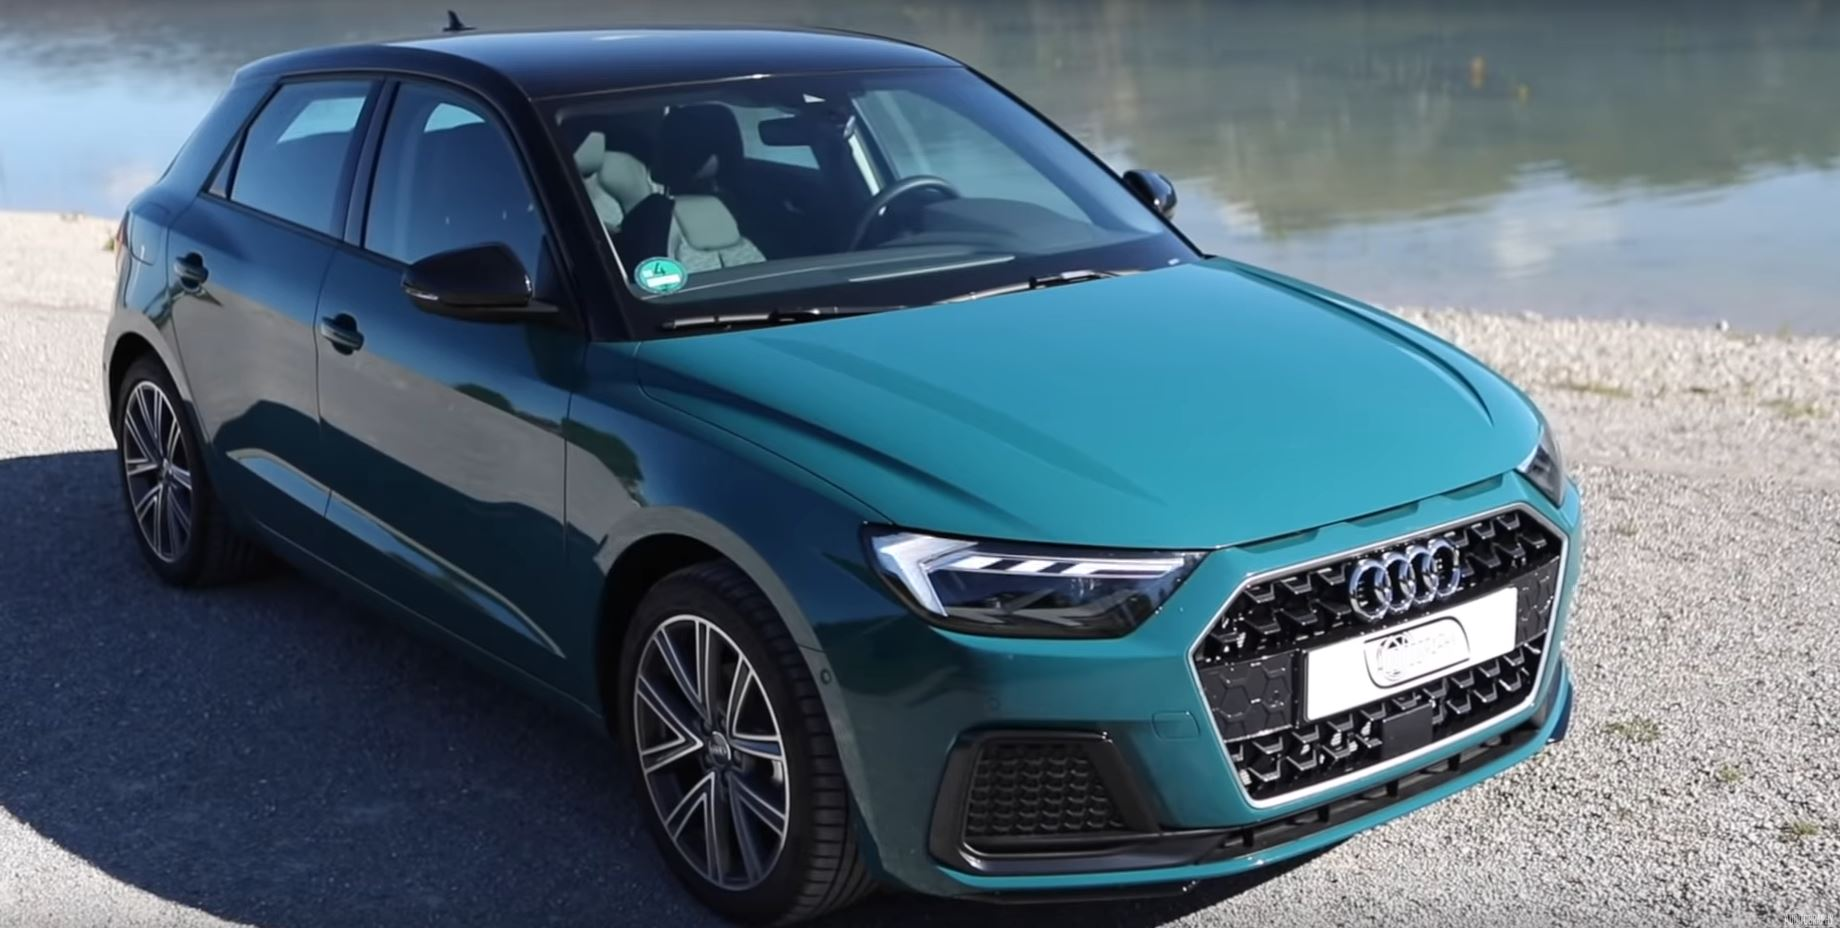 Luxury Car Brands >> Audi A1 allroad quattro Looks Like a Lifestyle Hatch - autoevolution